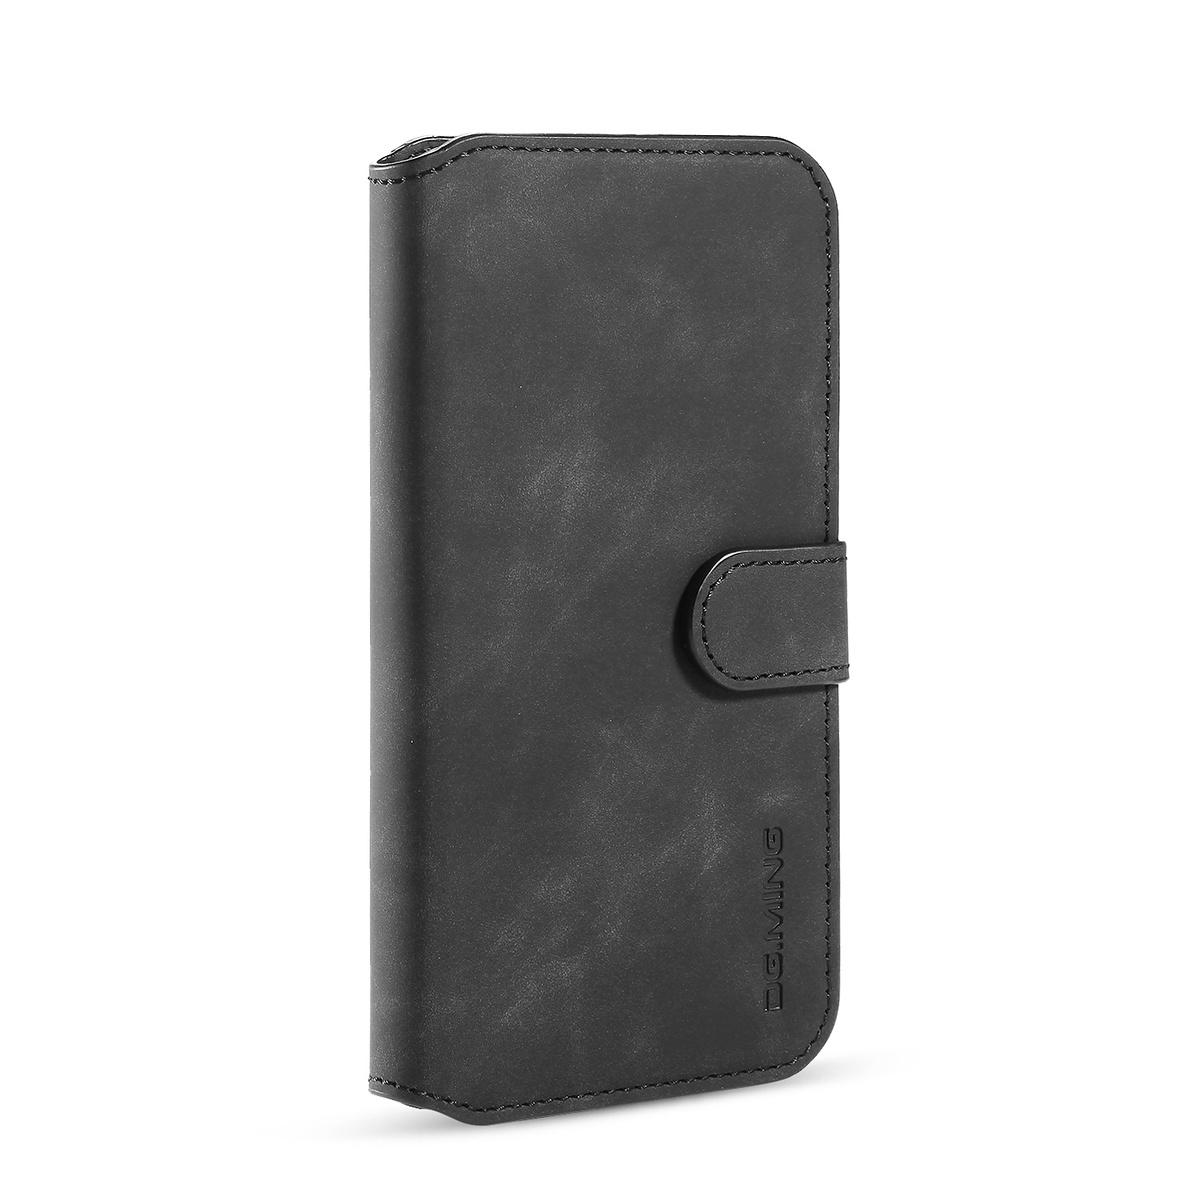 DG.MING Retro läderfodral, ställ/kortplats, iPhone 11, svart